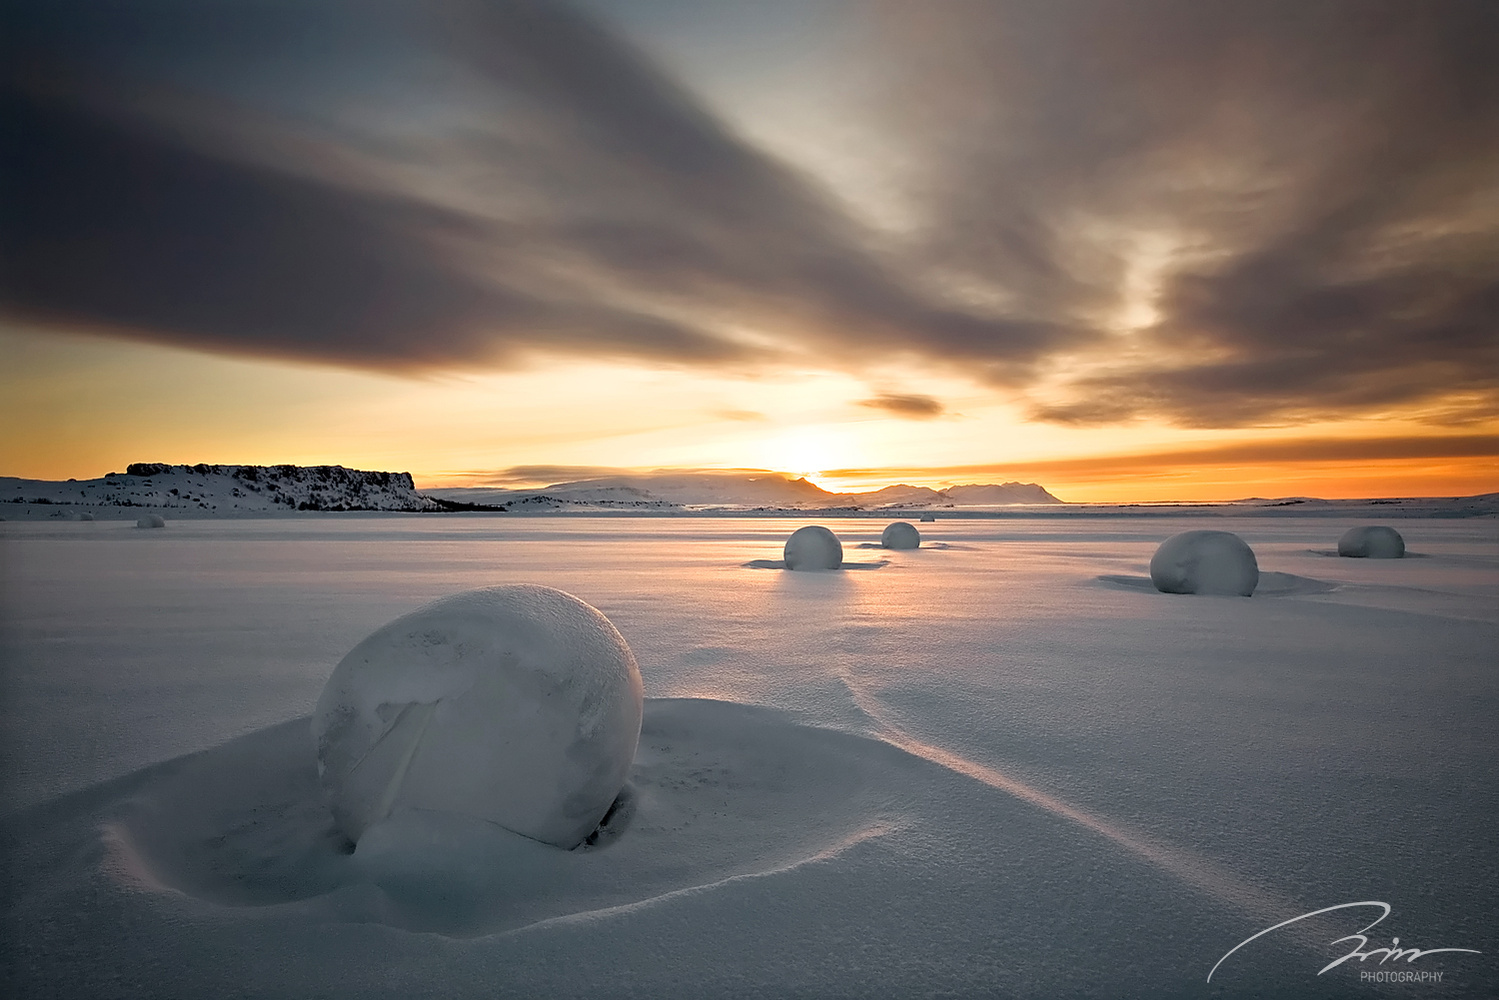 Snow Bales by Bragi Ingibergsson - BRIN